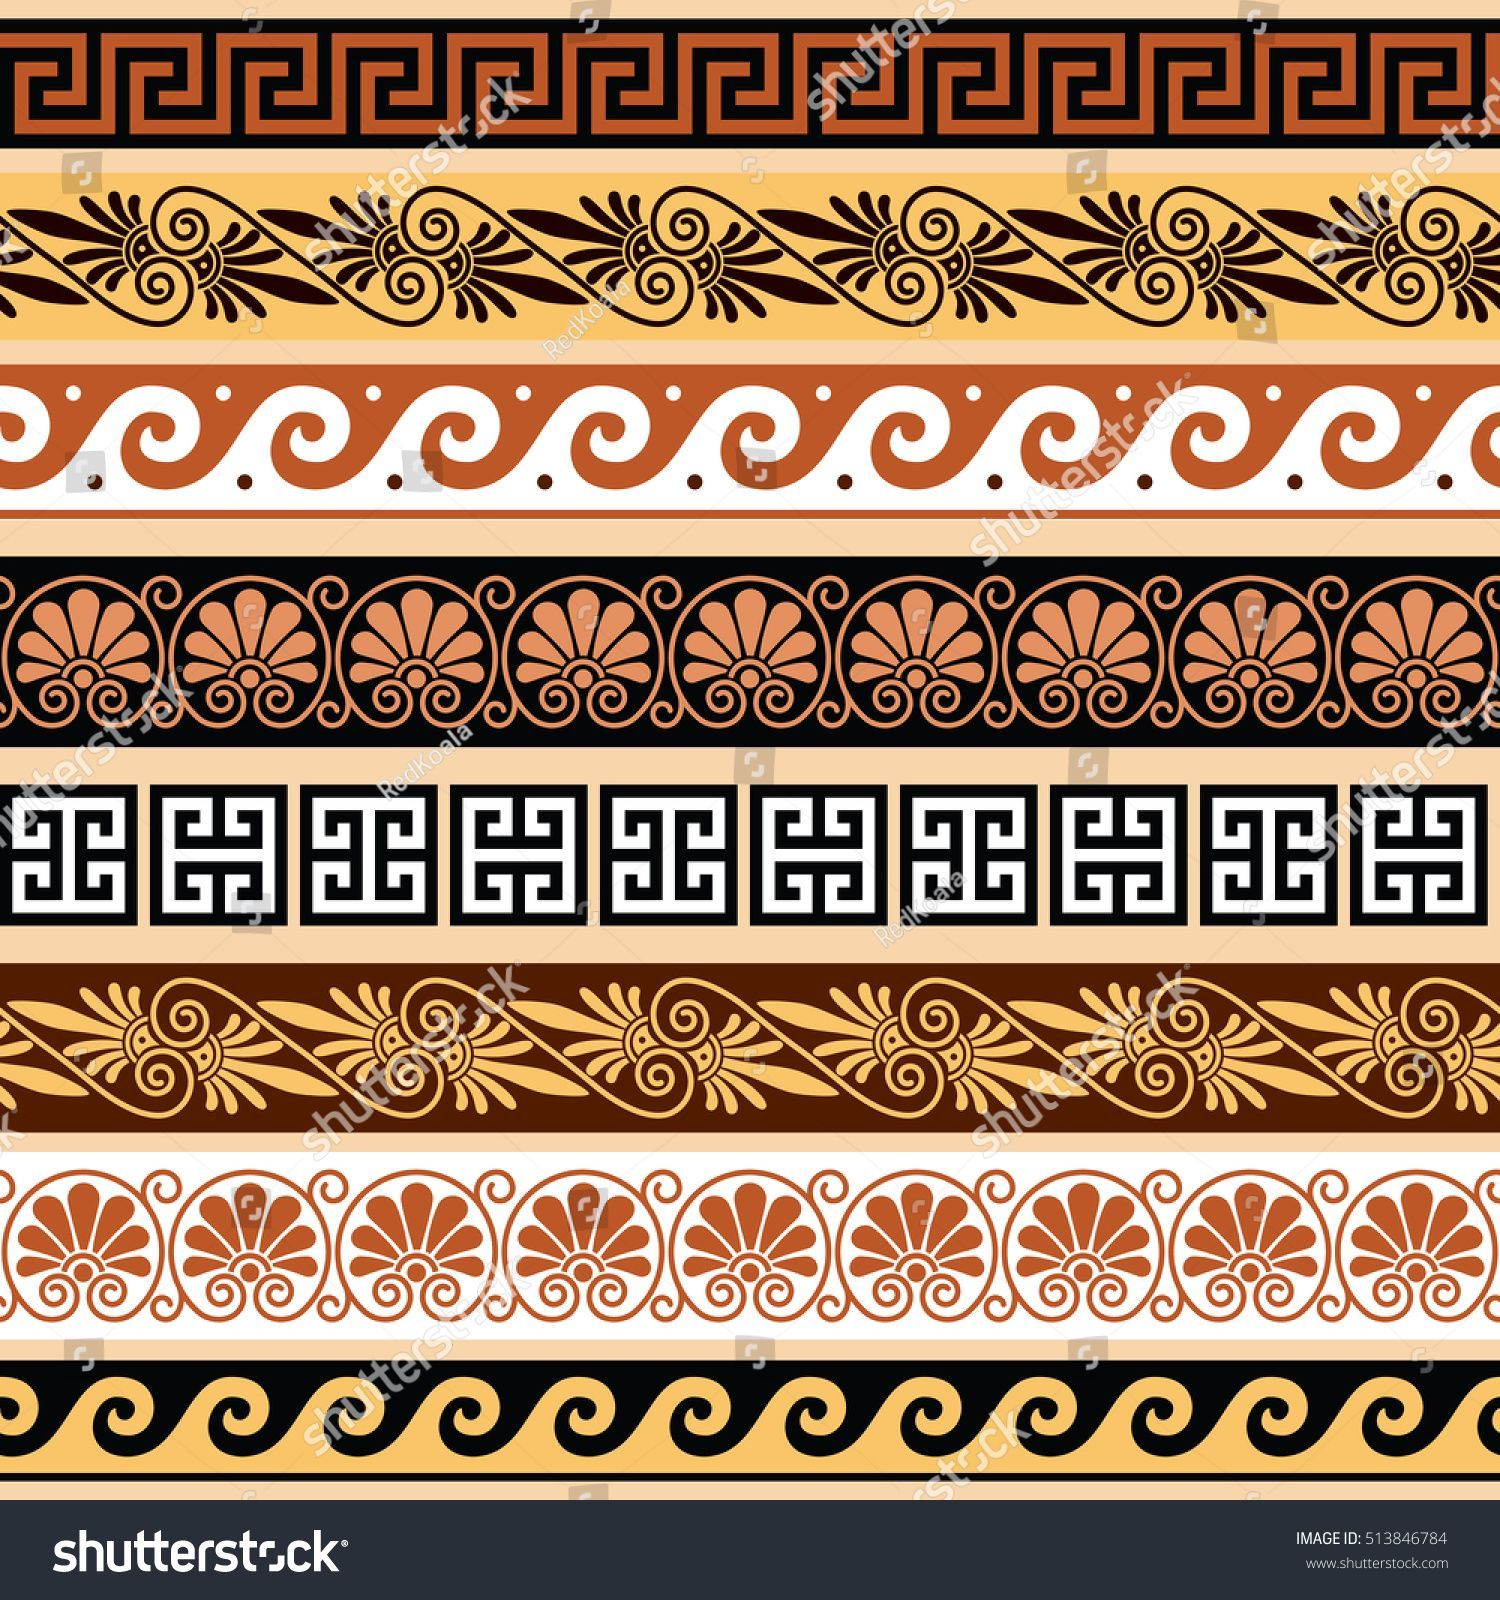 Griechische Muster Vektor Abbildung Illustration 14